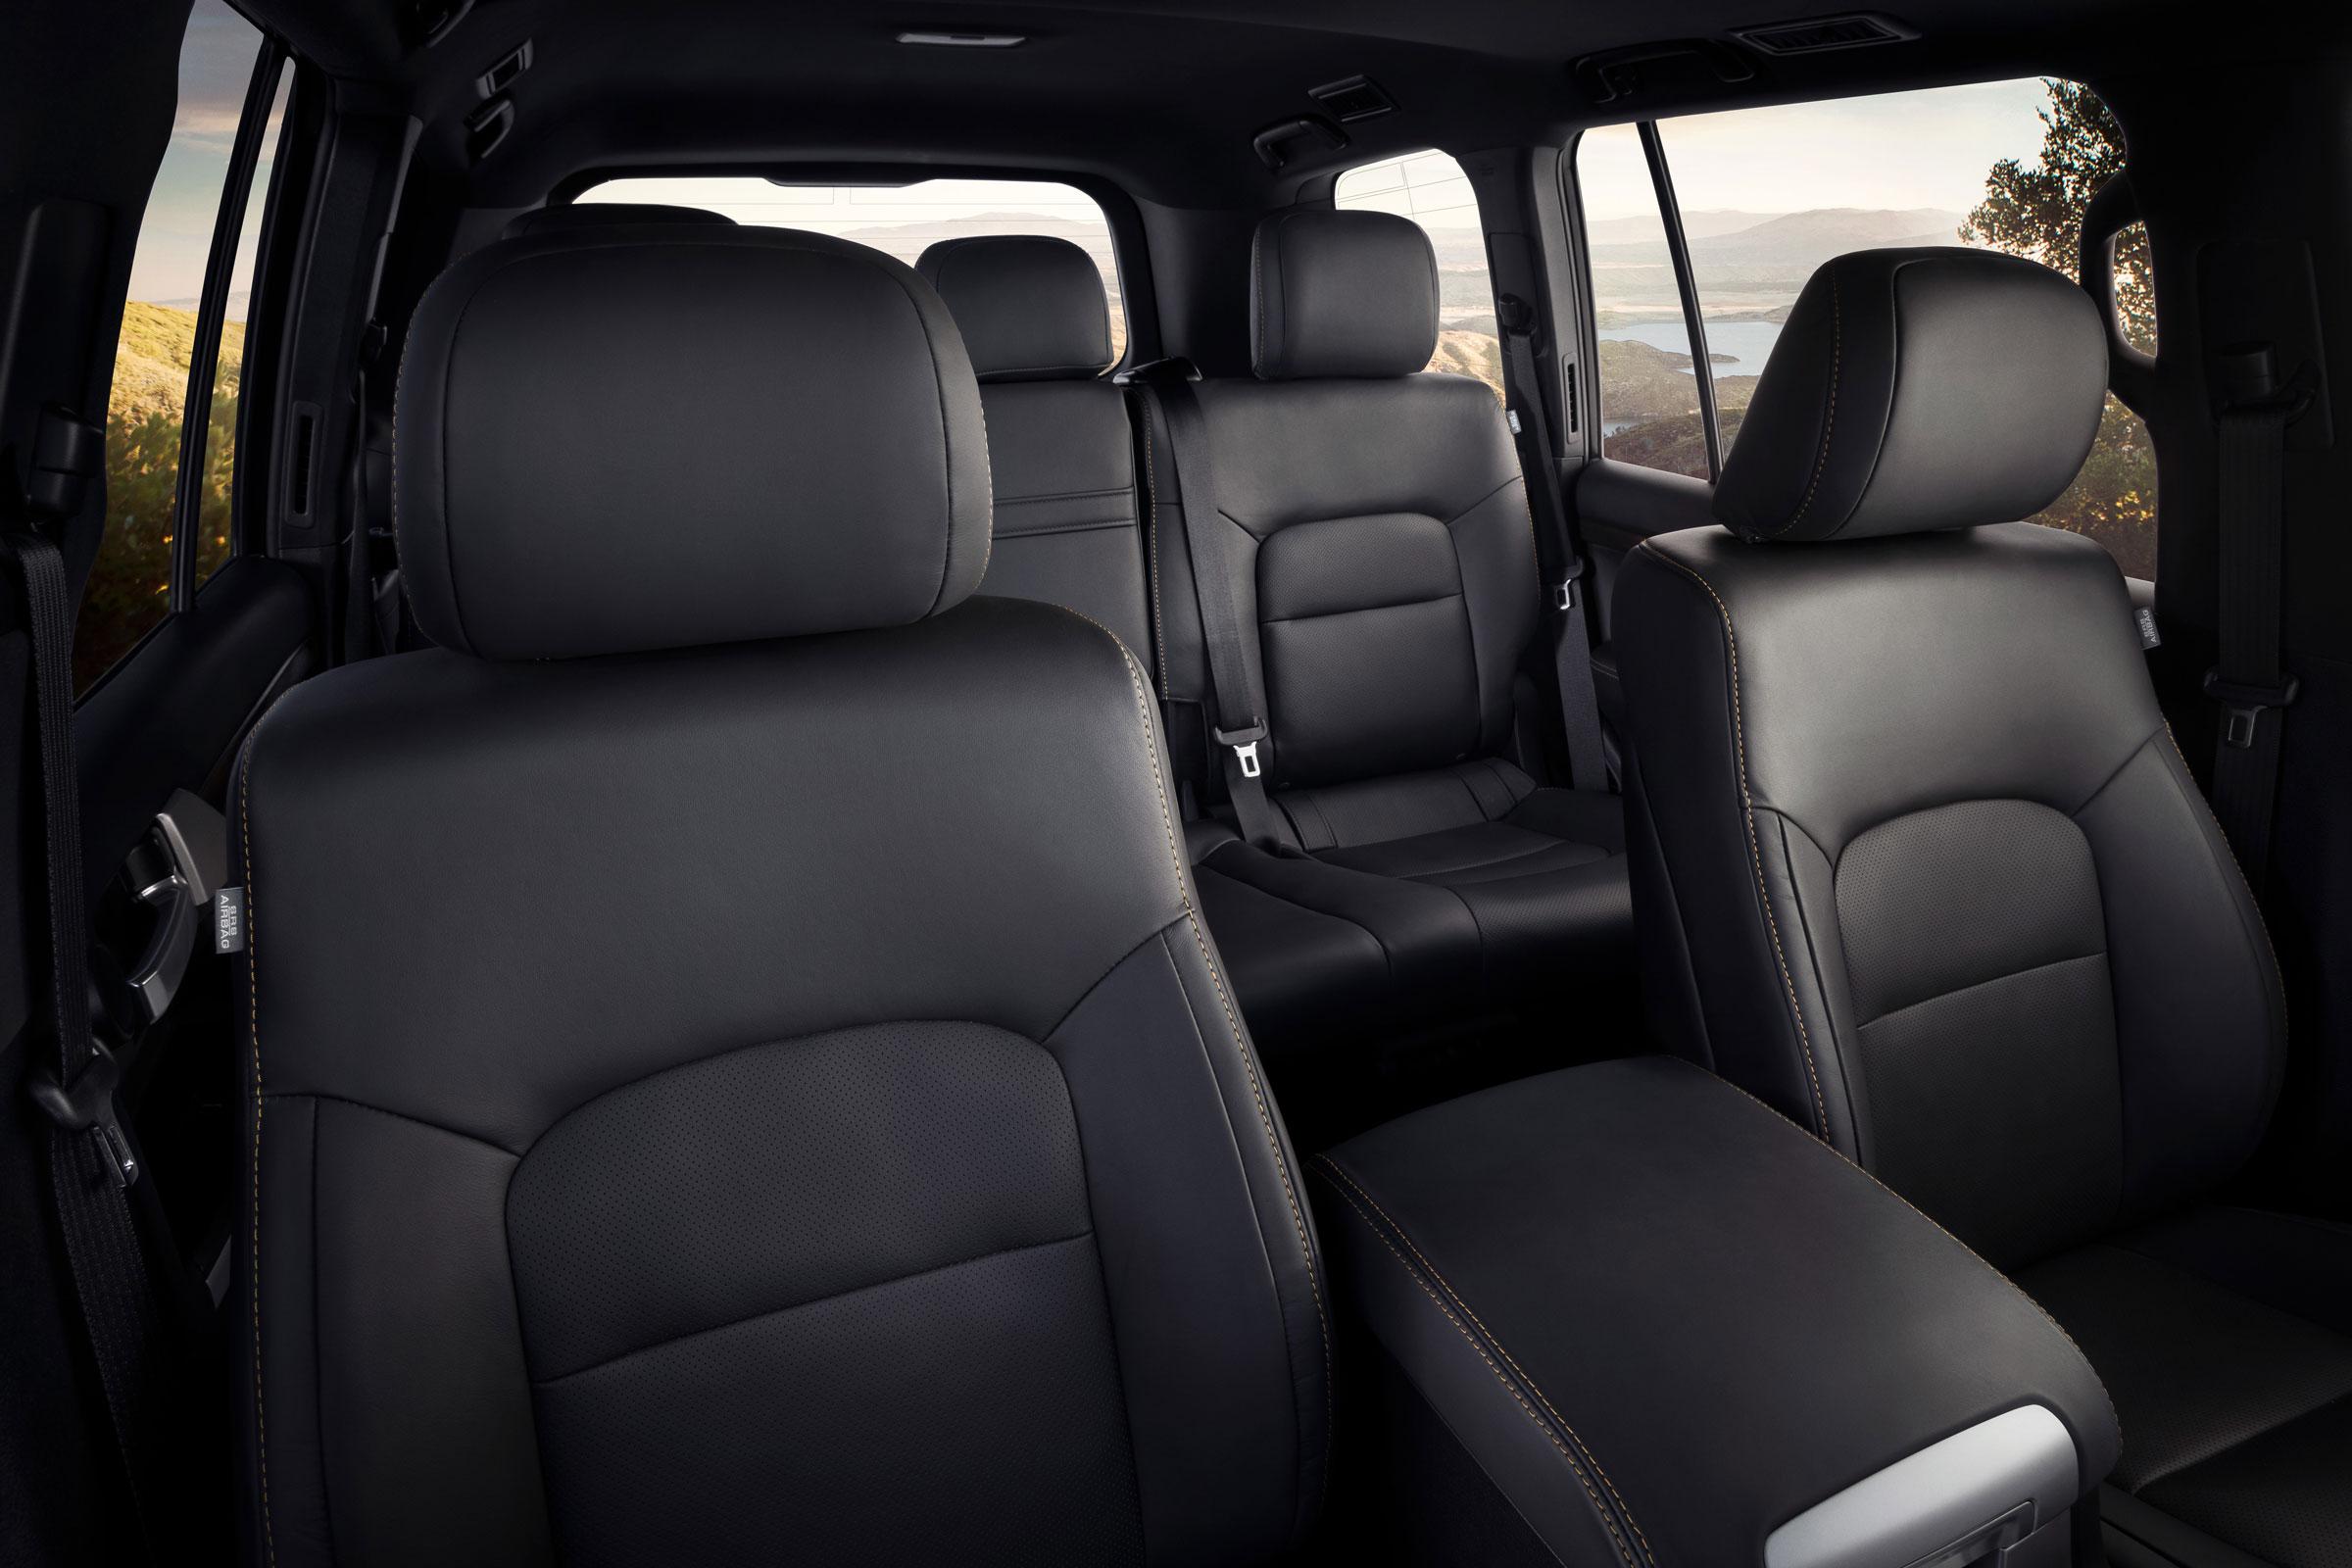 2020_Land_Cruiser_Heritage_Edition-interior.jpg